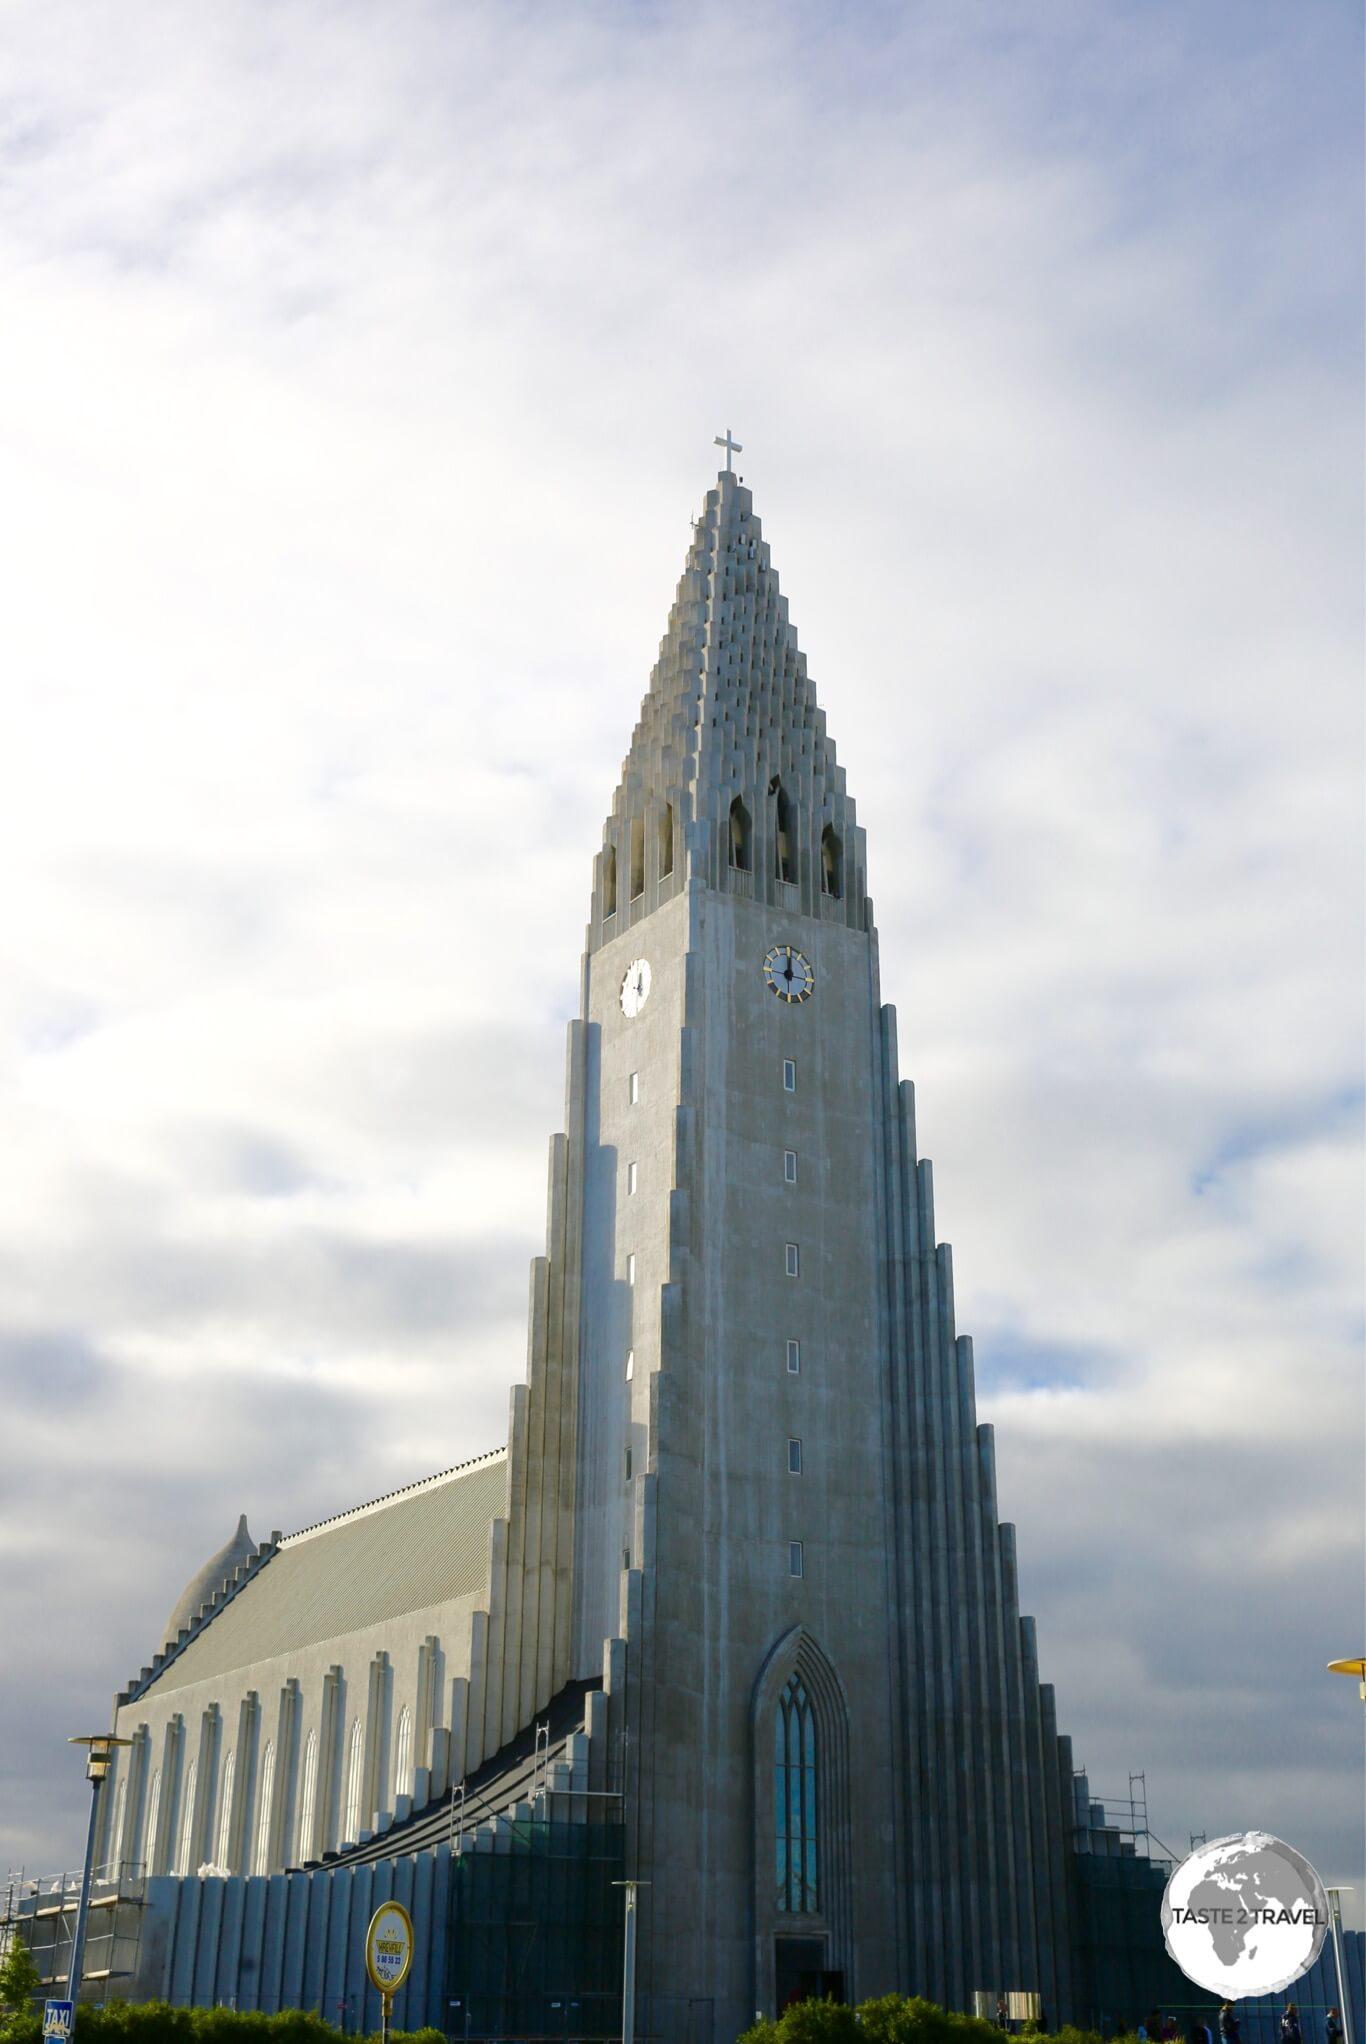 The towering Hallgrímskirkja (church) in Reykjavik.